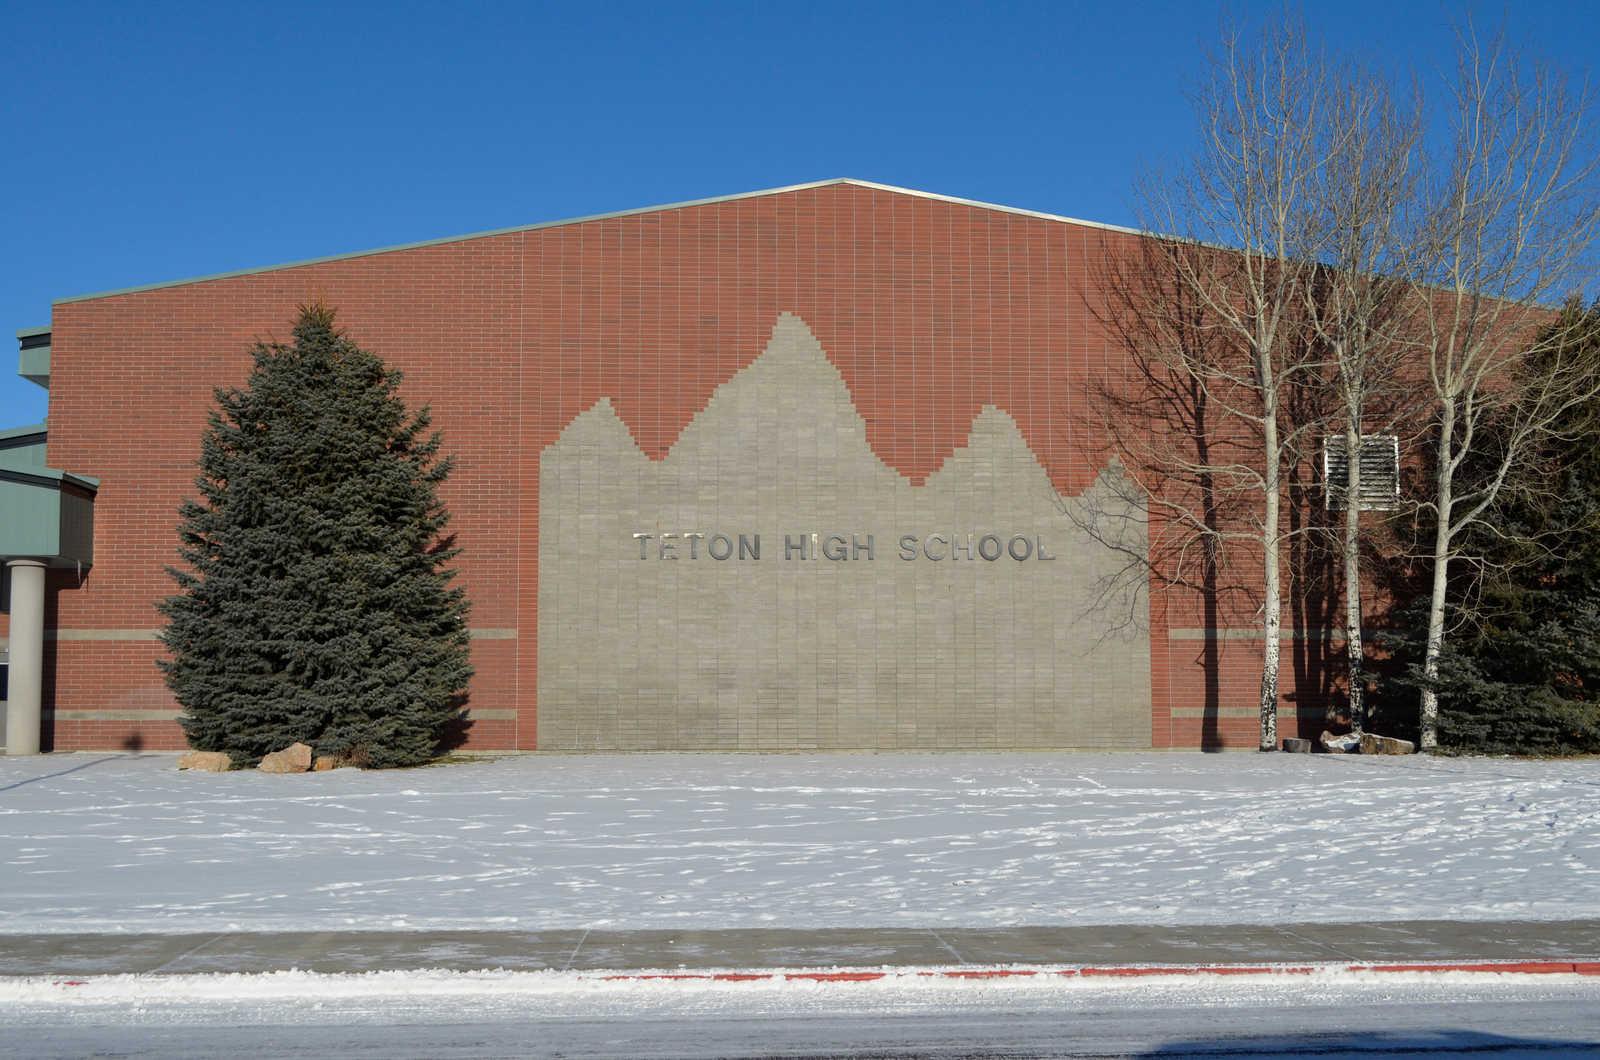 Teton High School